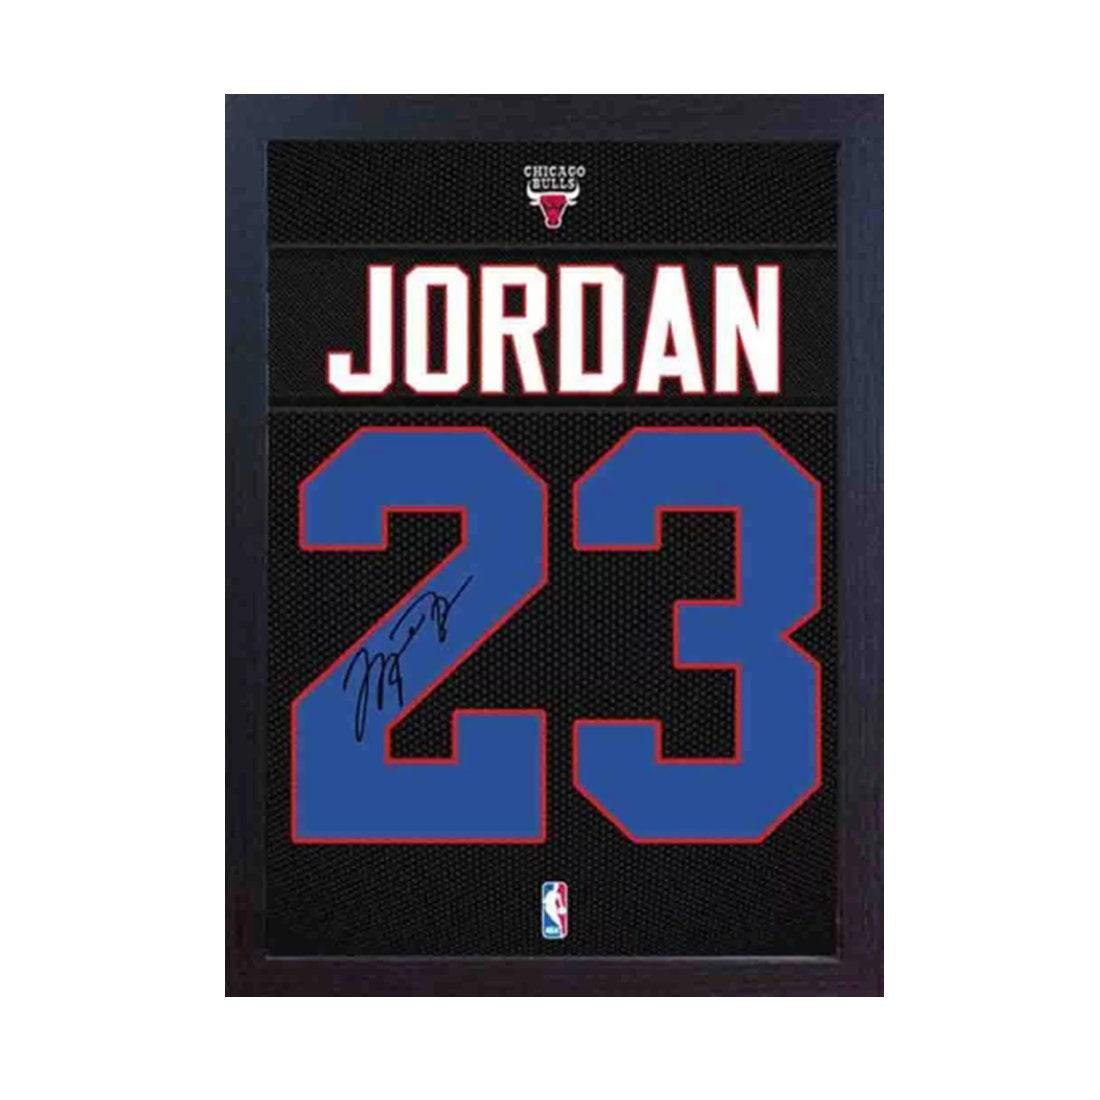 Michael Jordan Chicago Bulls signiert Autogramm NBA gerahmt | Etsy